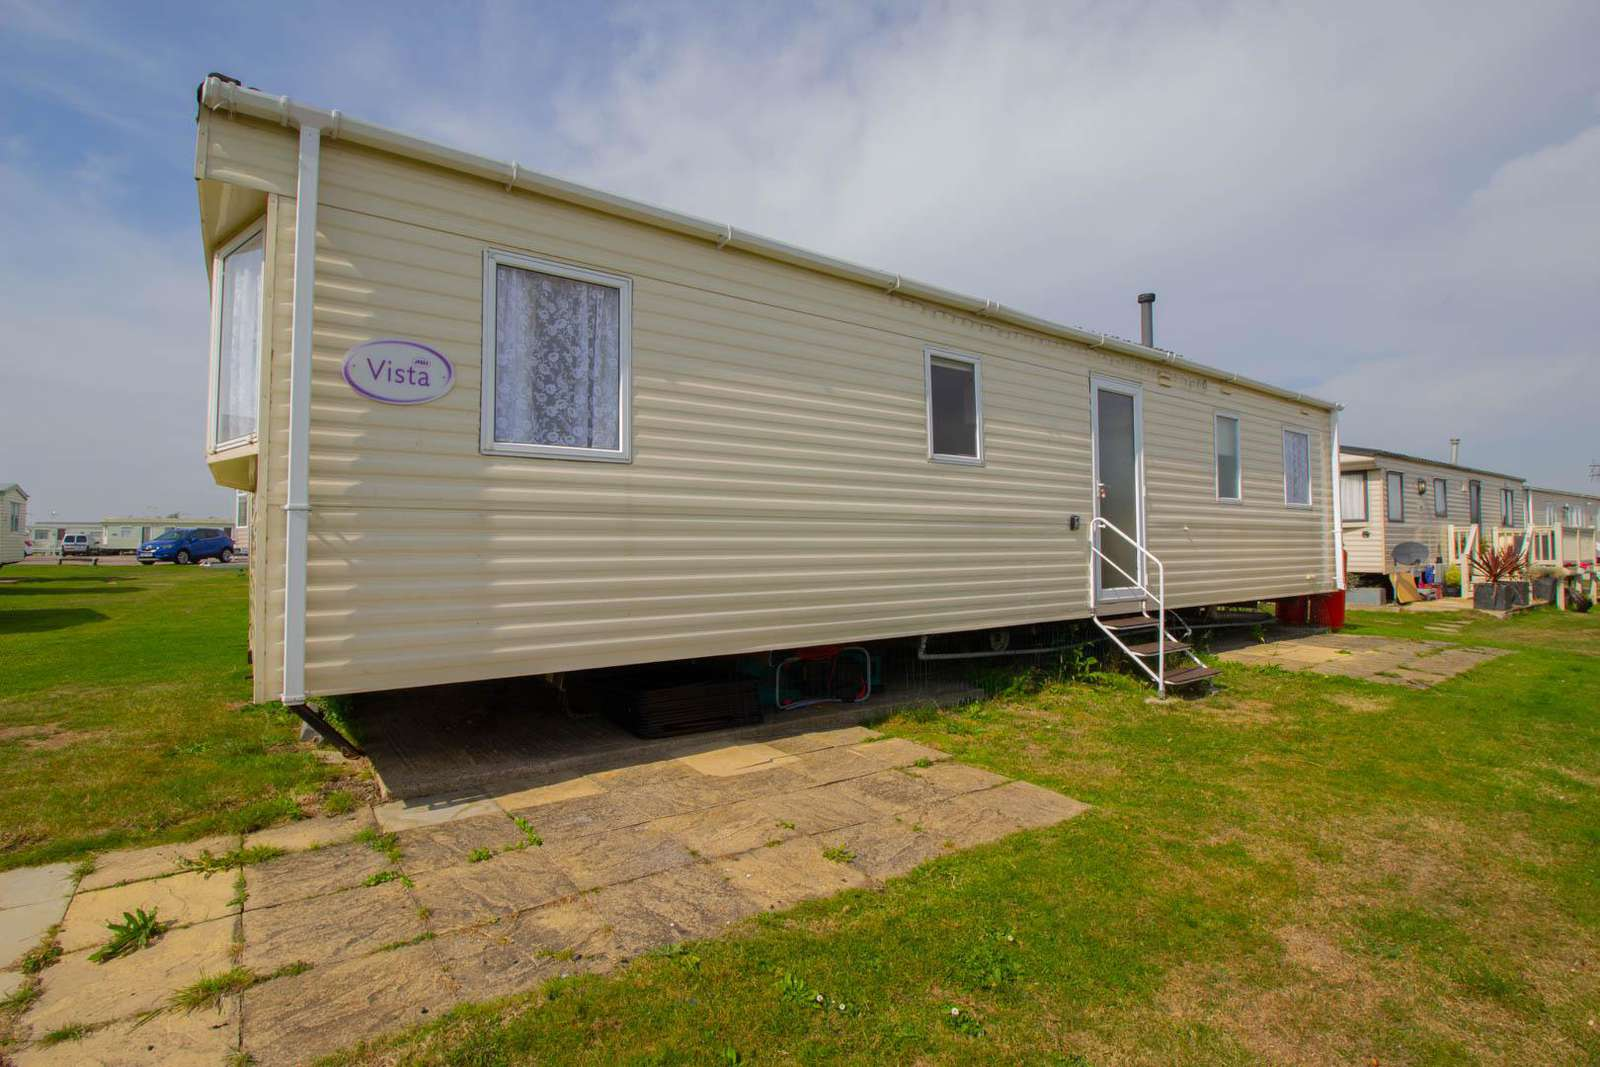 28036BW – Beach Walk area, 3 bed, 8 berth caravan. Emerald rated. - property